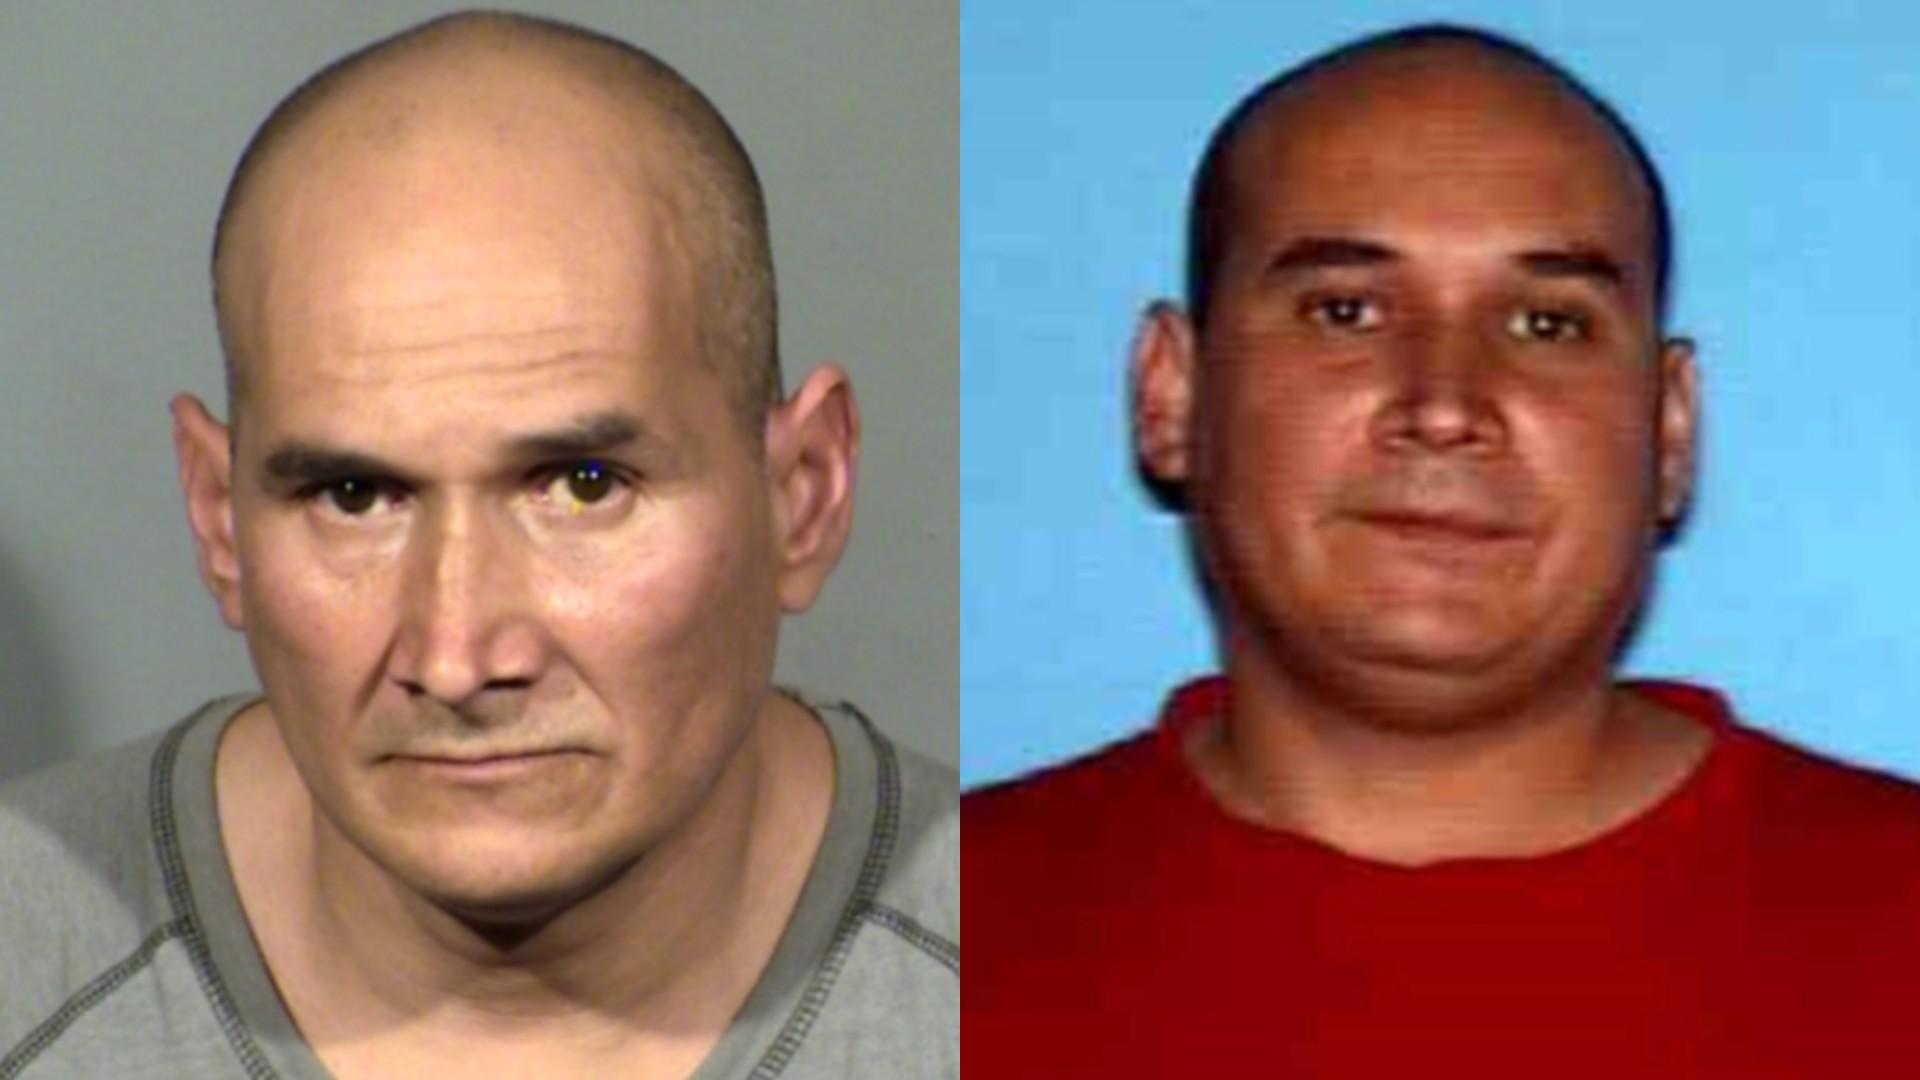 LAPD released these photos of Juan Ramon Sanchez.